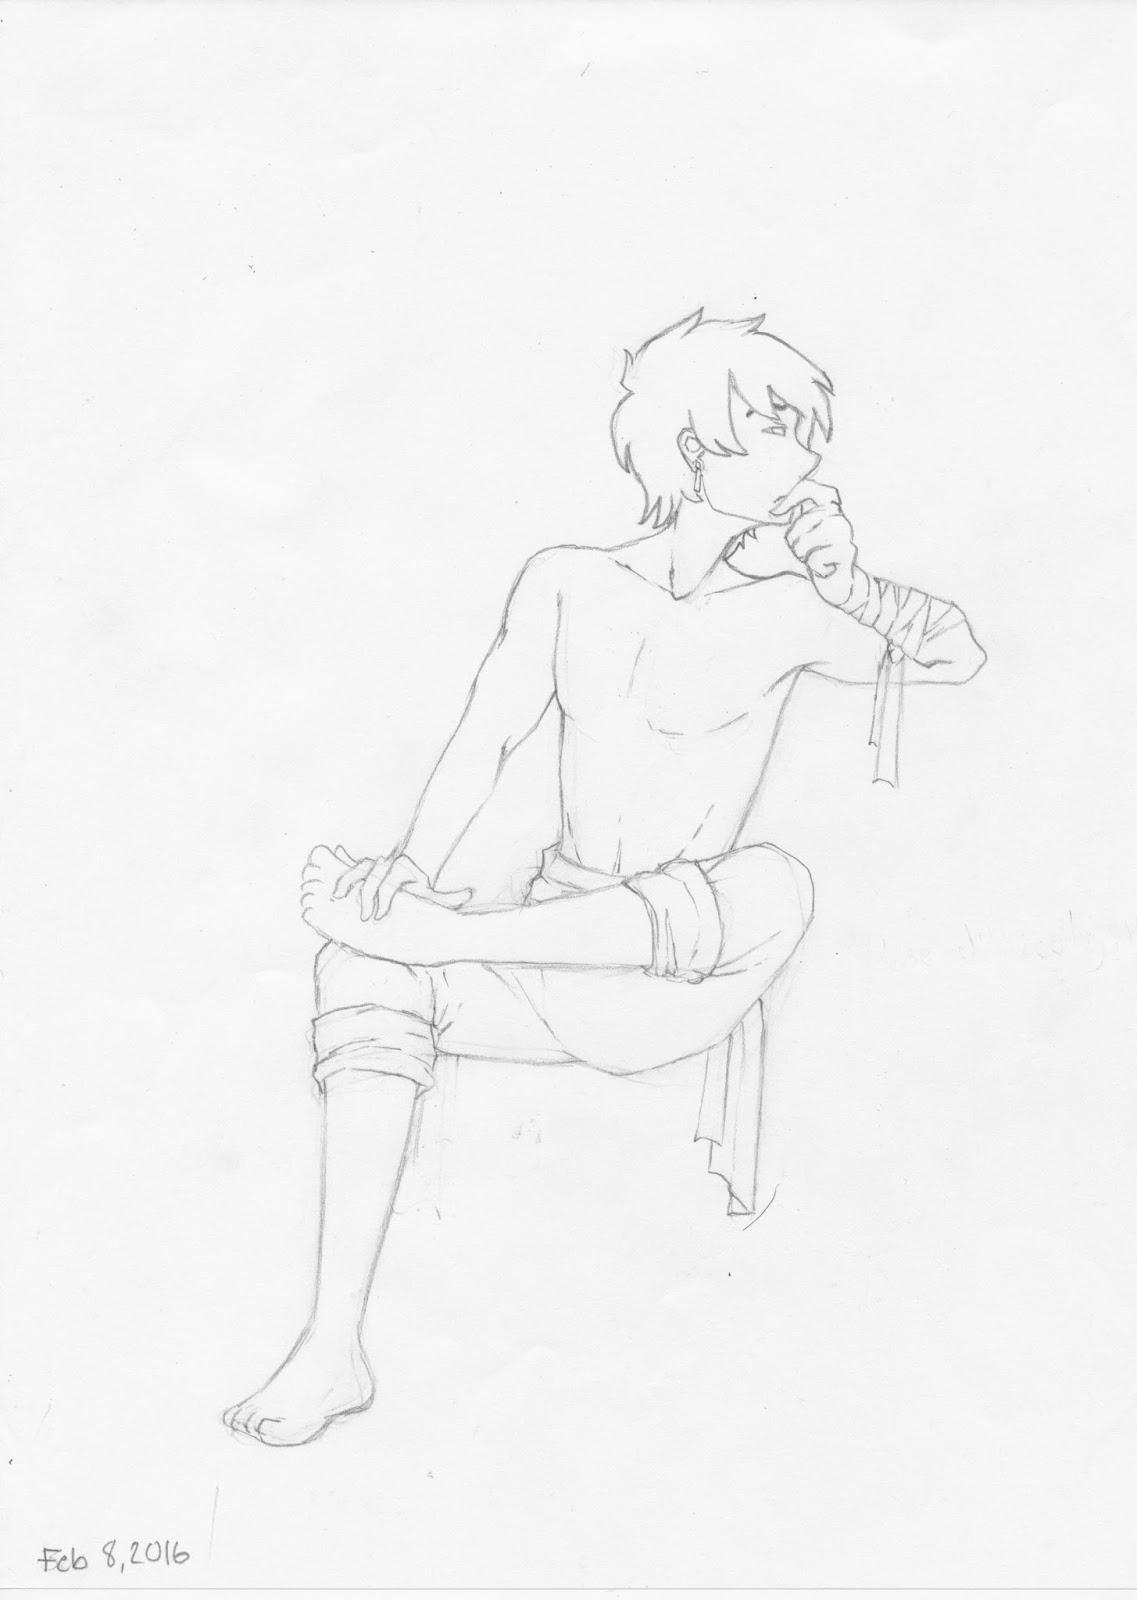 Manga Interest Manga Boy Sitting Pose